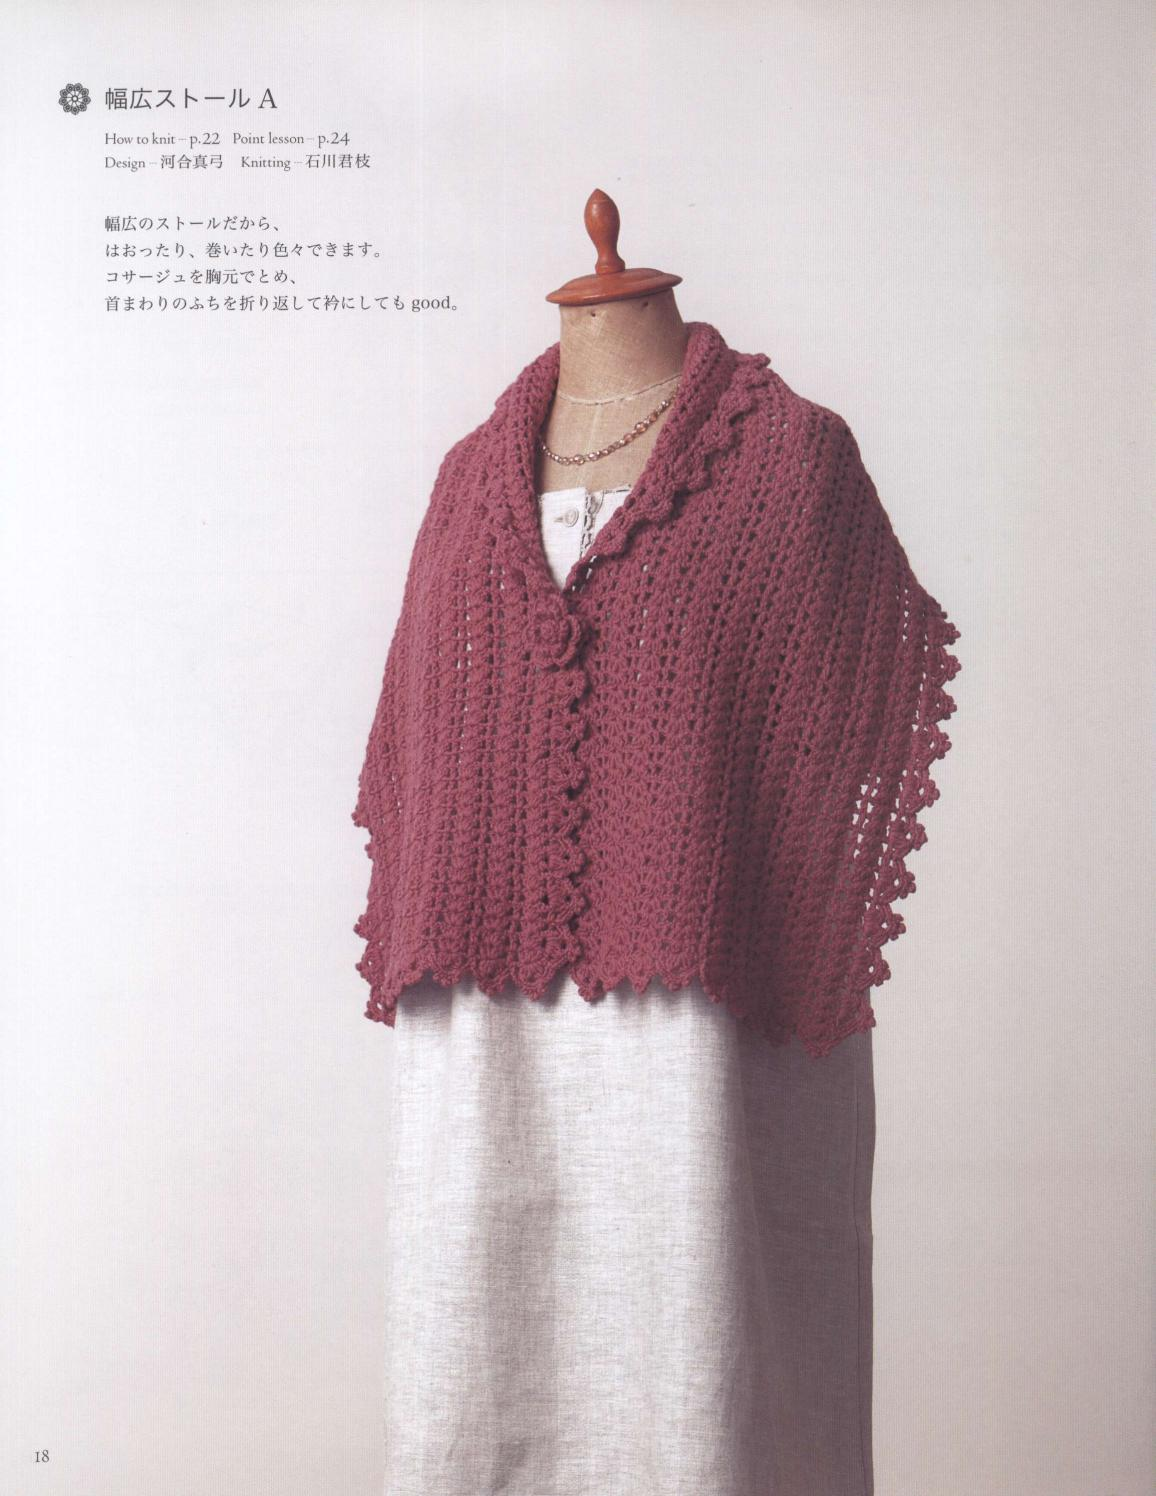 Asahi original crochet best selection 2012 page 18